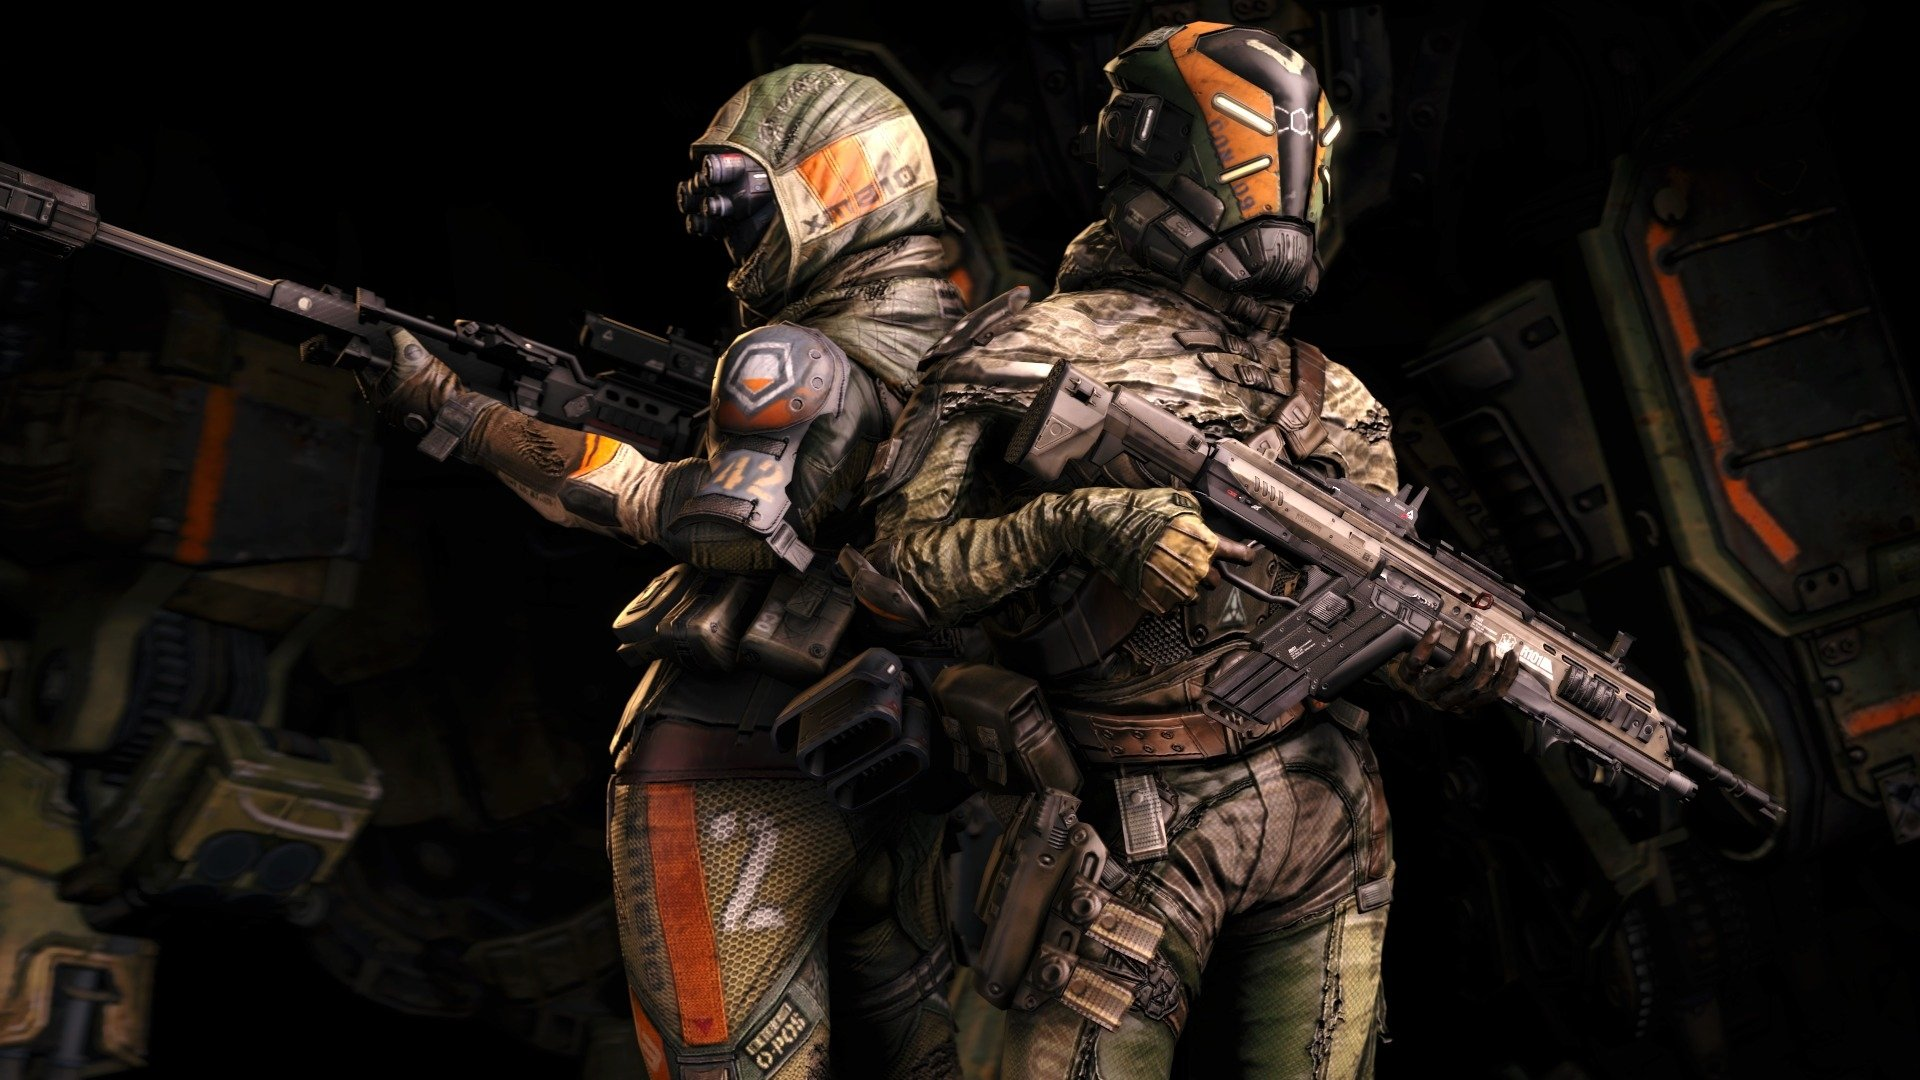 Video Game - Titanfall  Sniper Rifle Gun Weapon Warrior Sci Fi Wallpaper